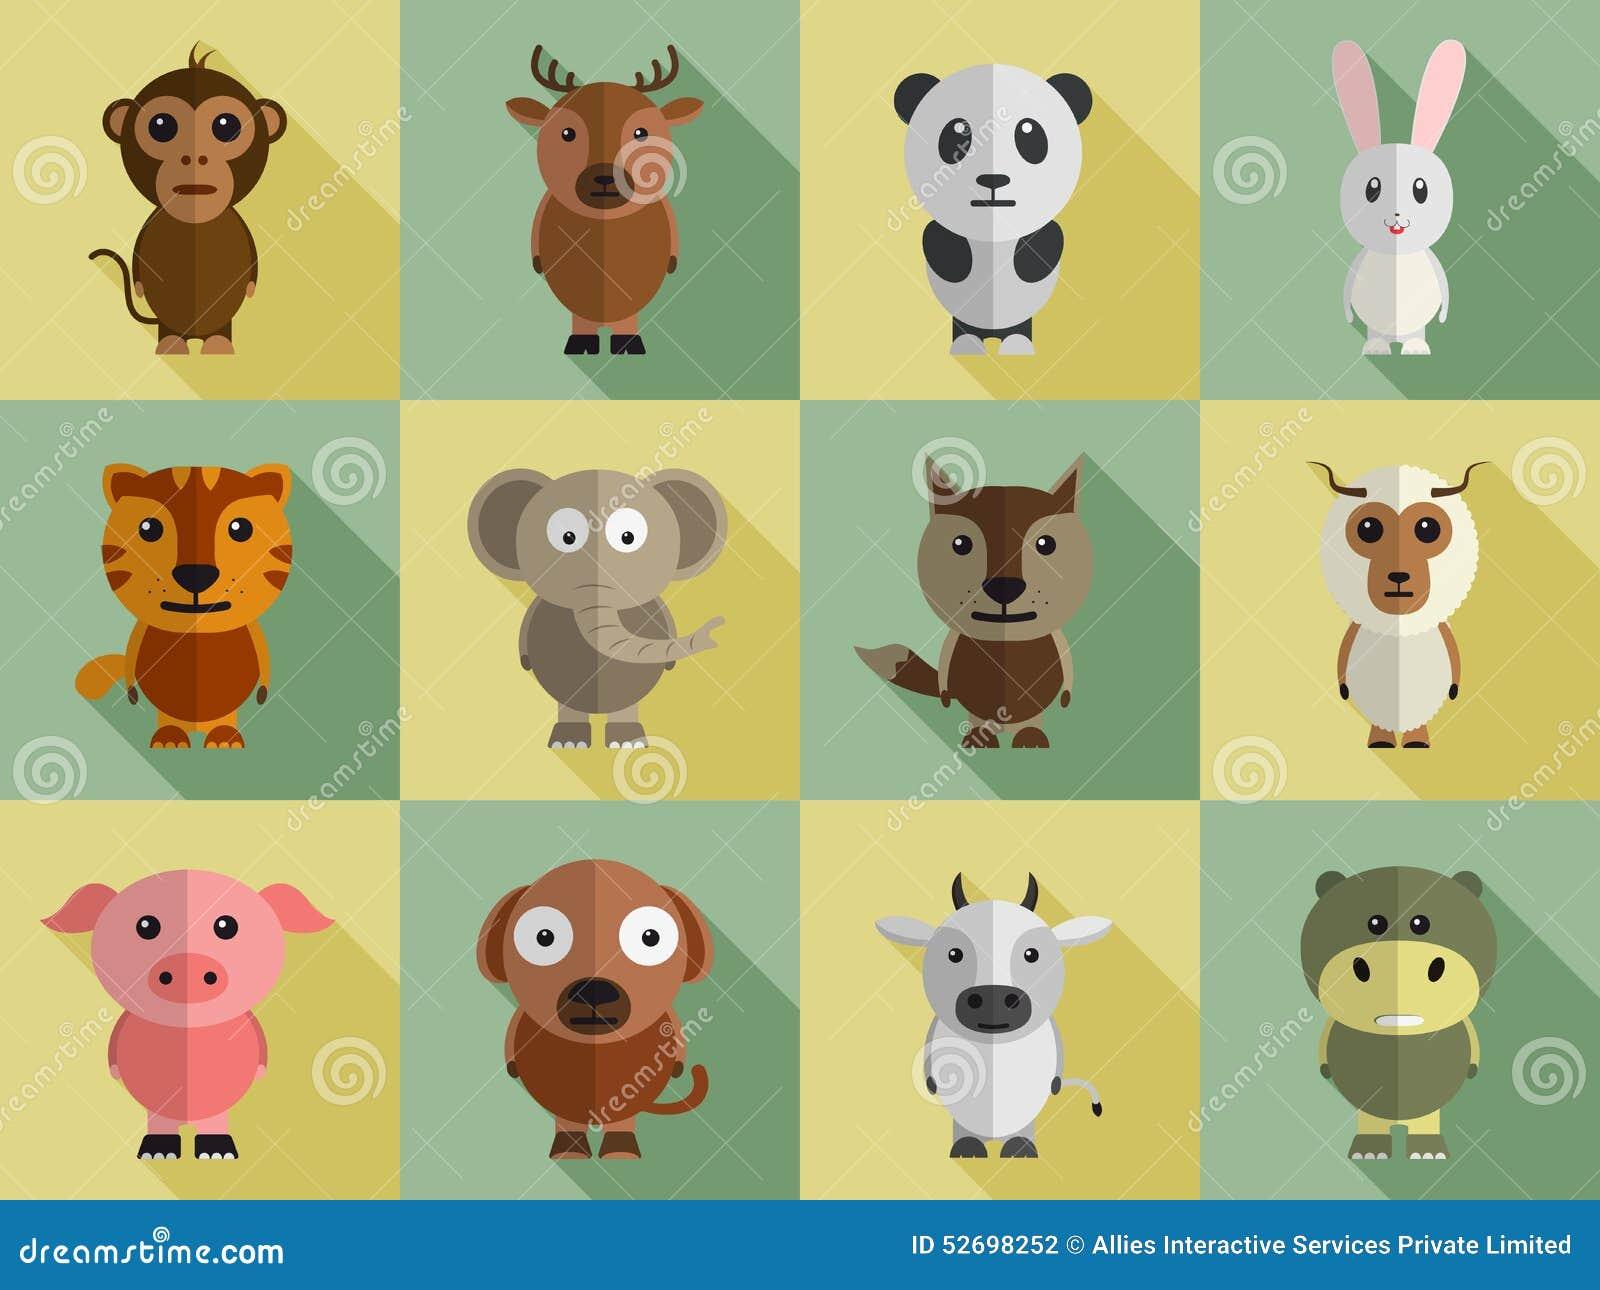 set of different animal characters stock illustration. Black Bedroom Furniture Sets. Home Design Ideas